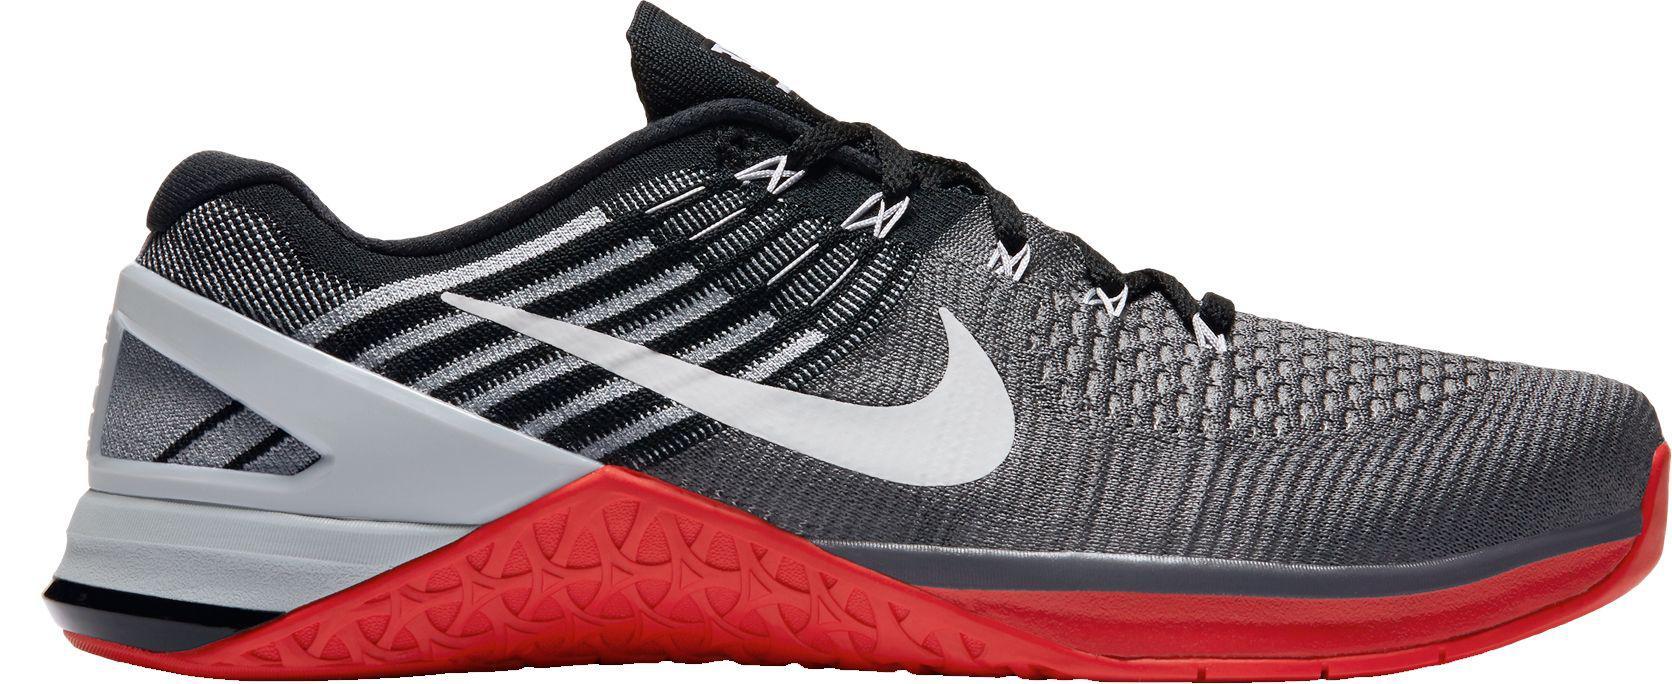 b2680585b770 Lyst - Nike Metcon Dsx Flyknit Training Shoes in Gray for Men